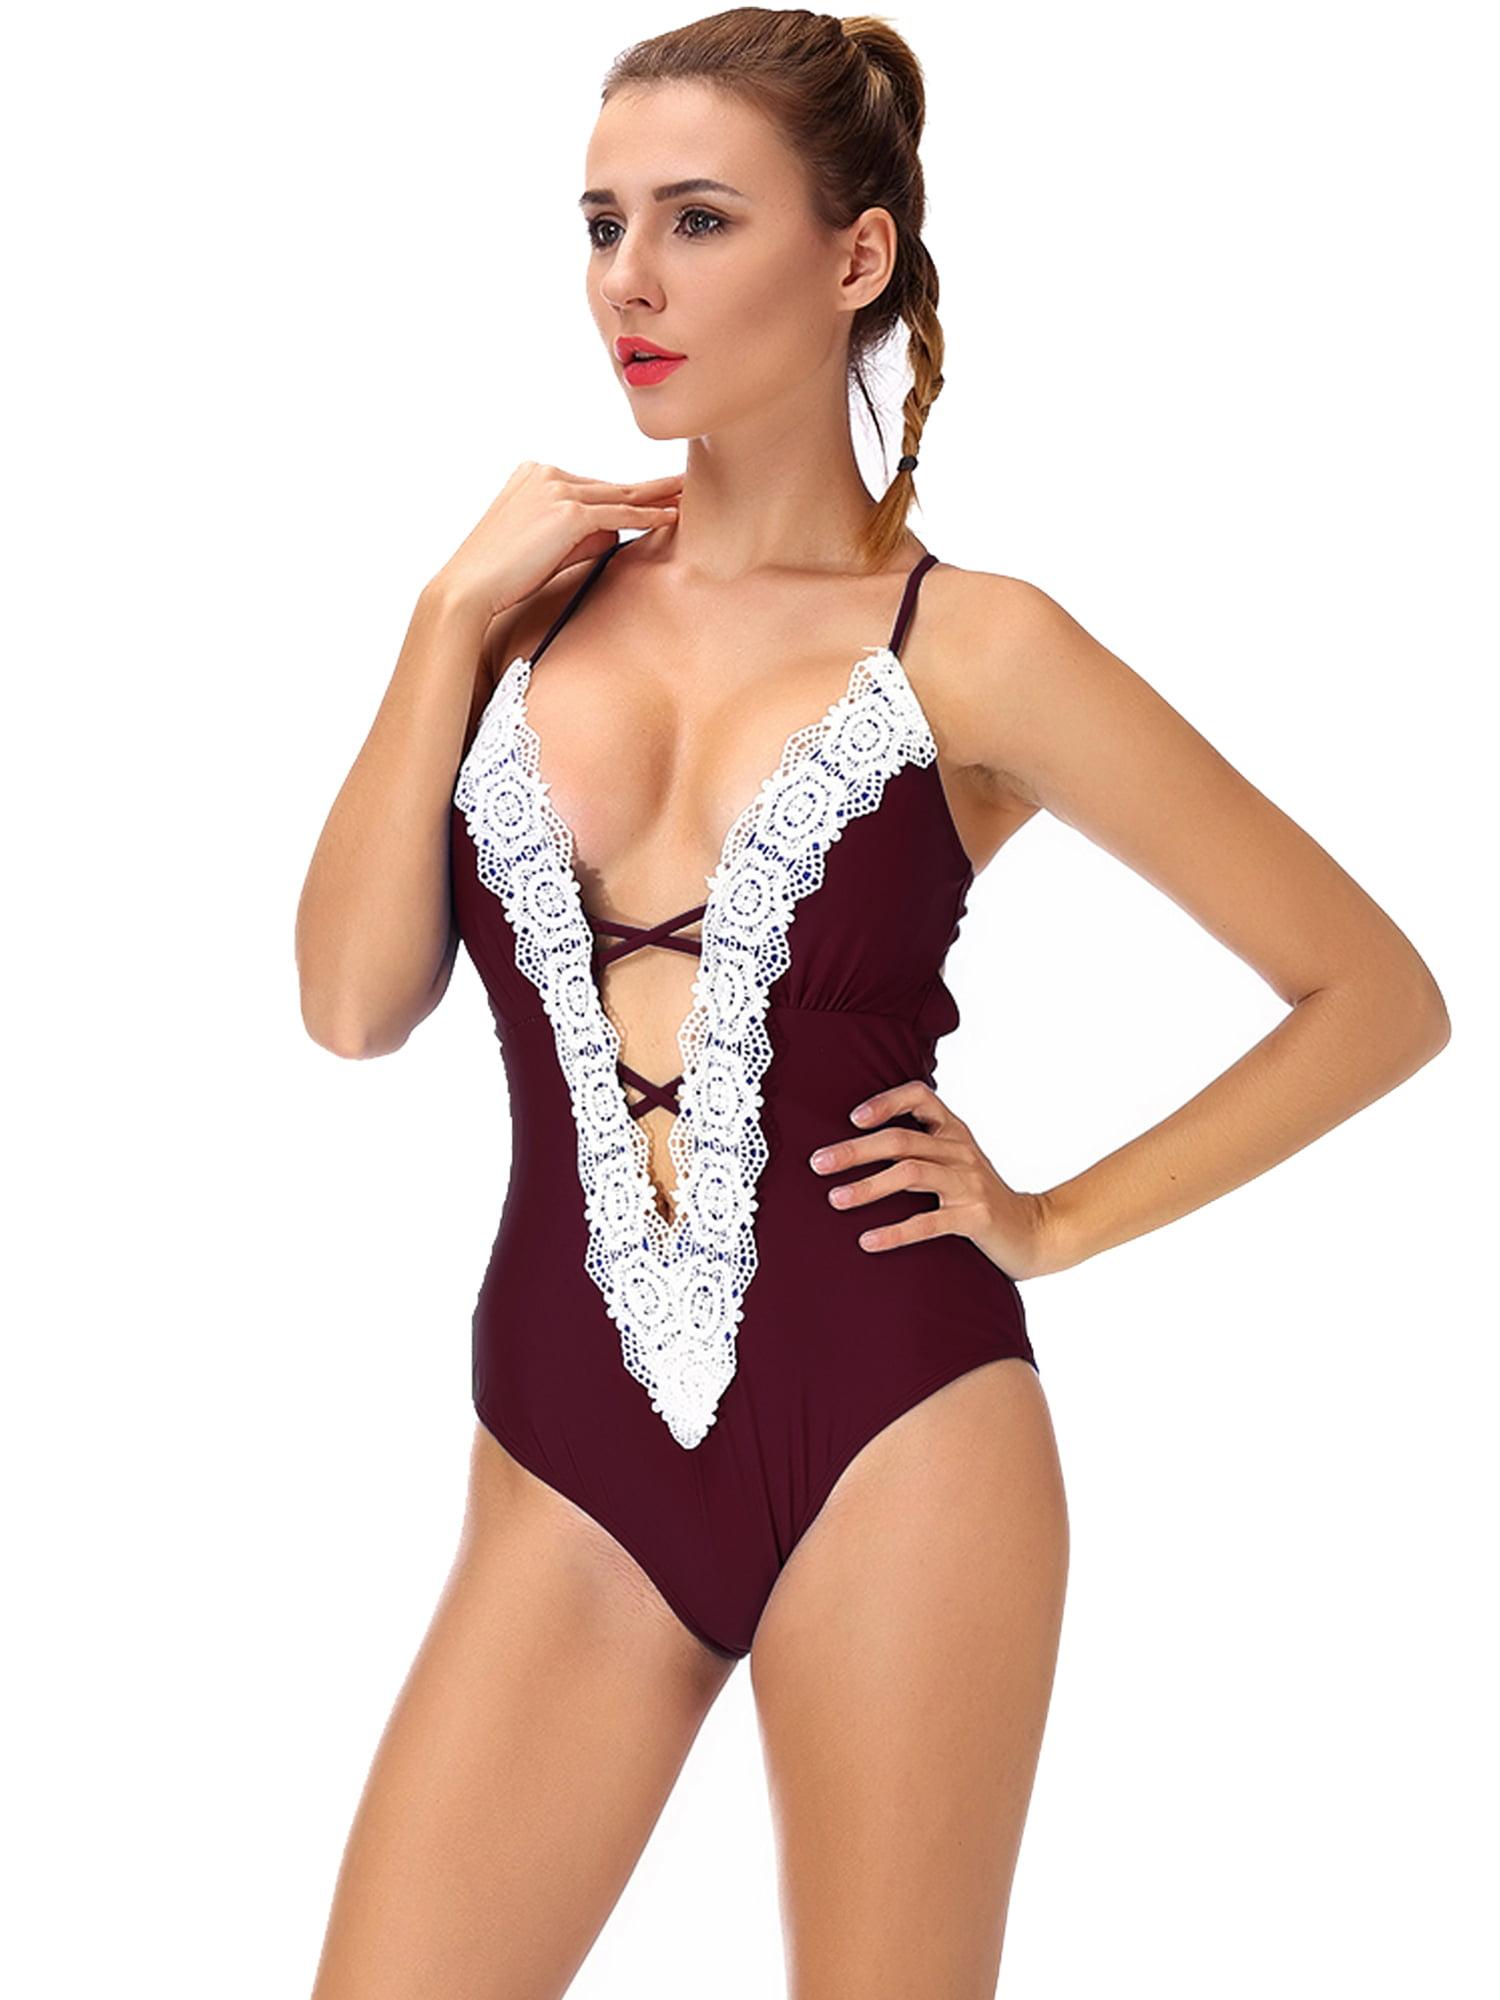 dd26ee9b14212 SAYFUT - Women's Deep V Neck One Piece Swimsuit Floral Lace Slimming Bikini  Bathing Suits Swimwear - Walmart.com